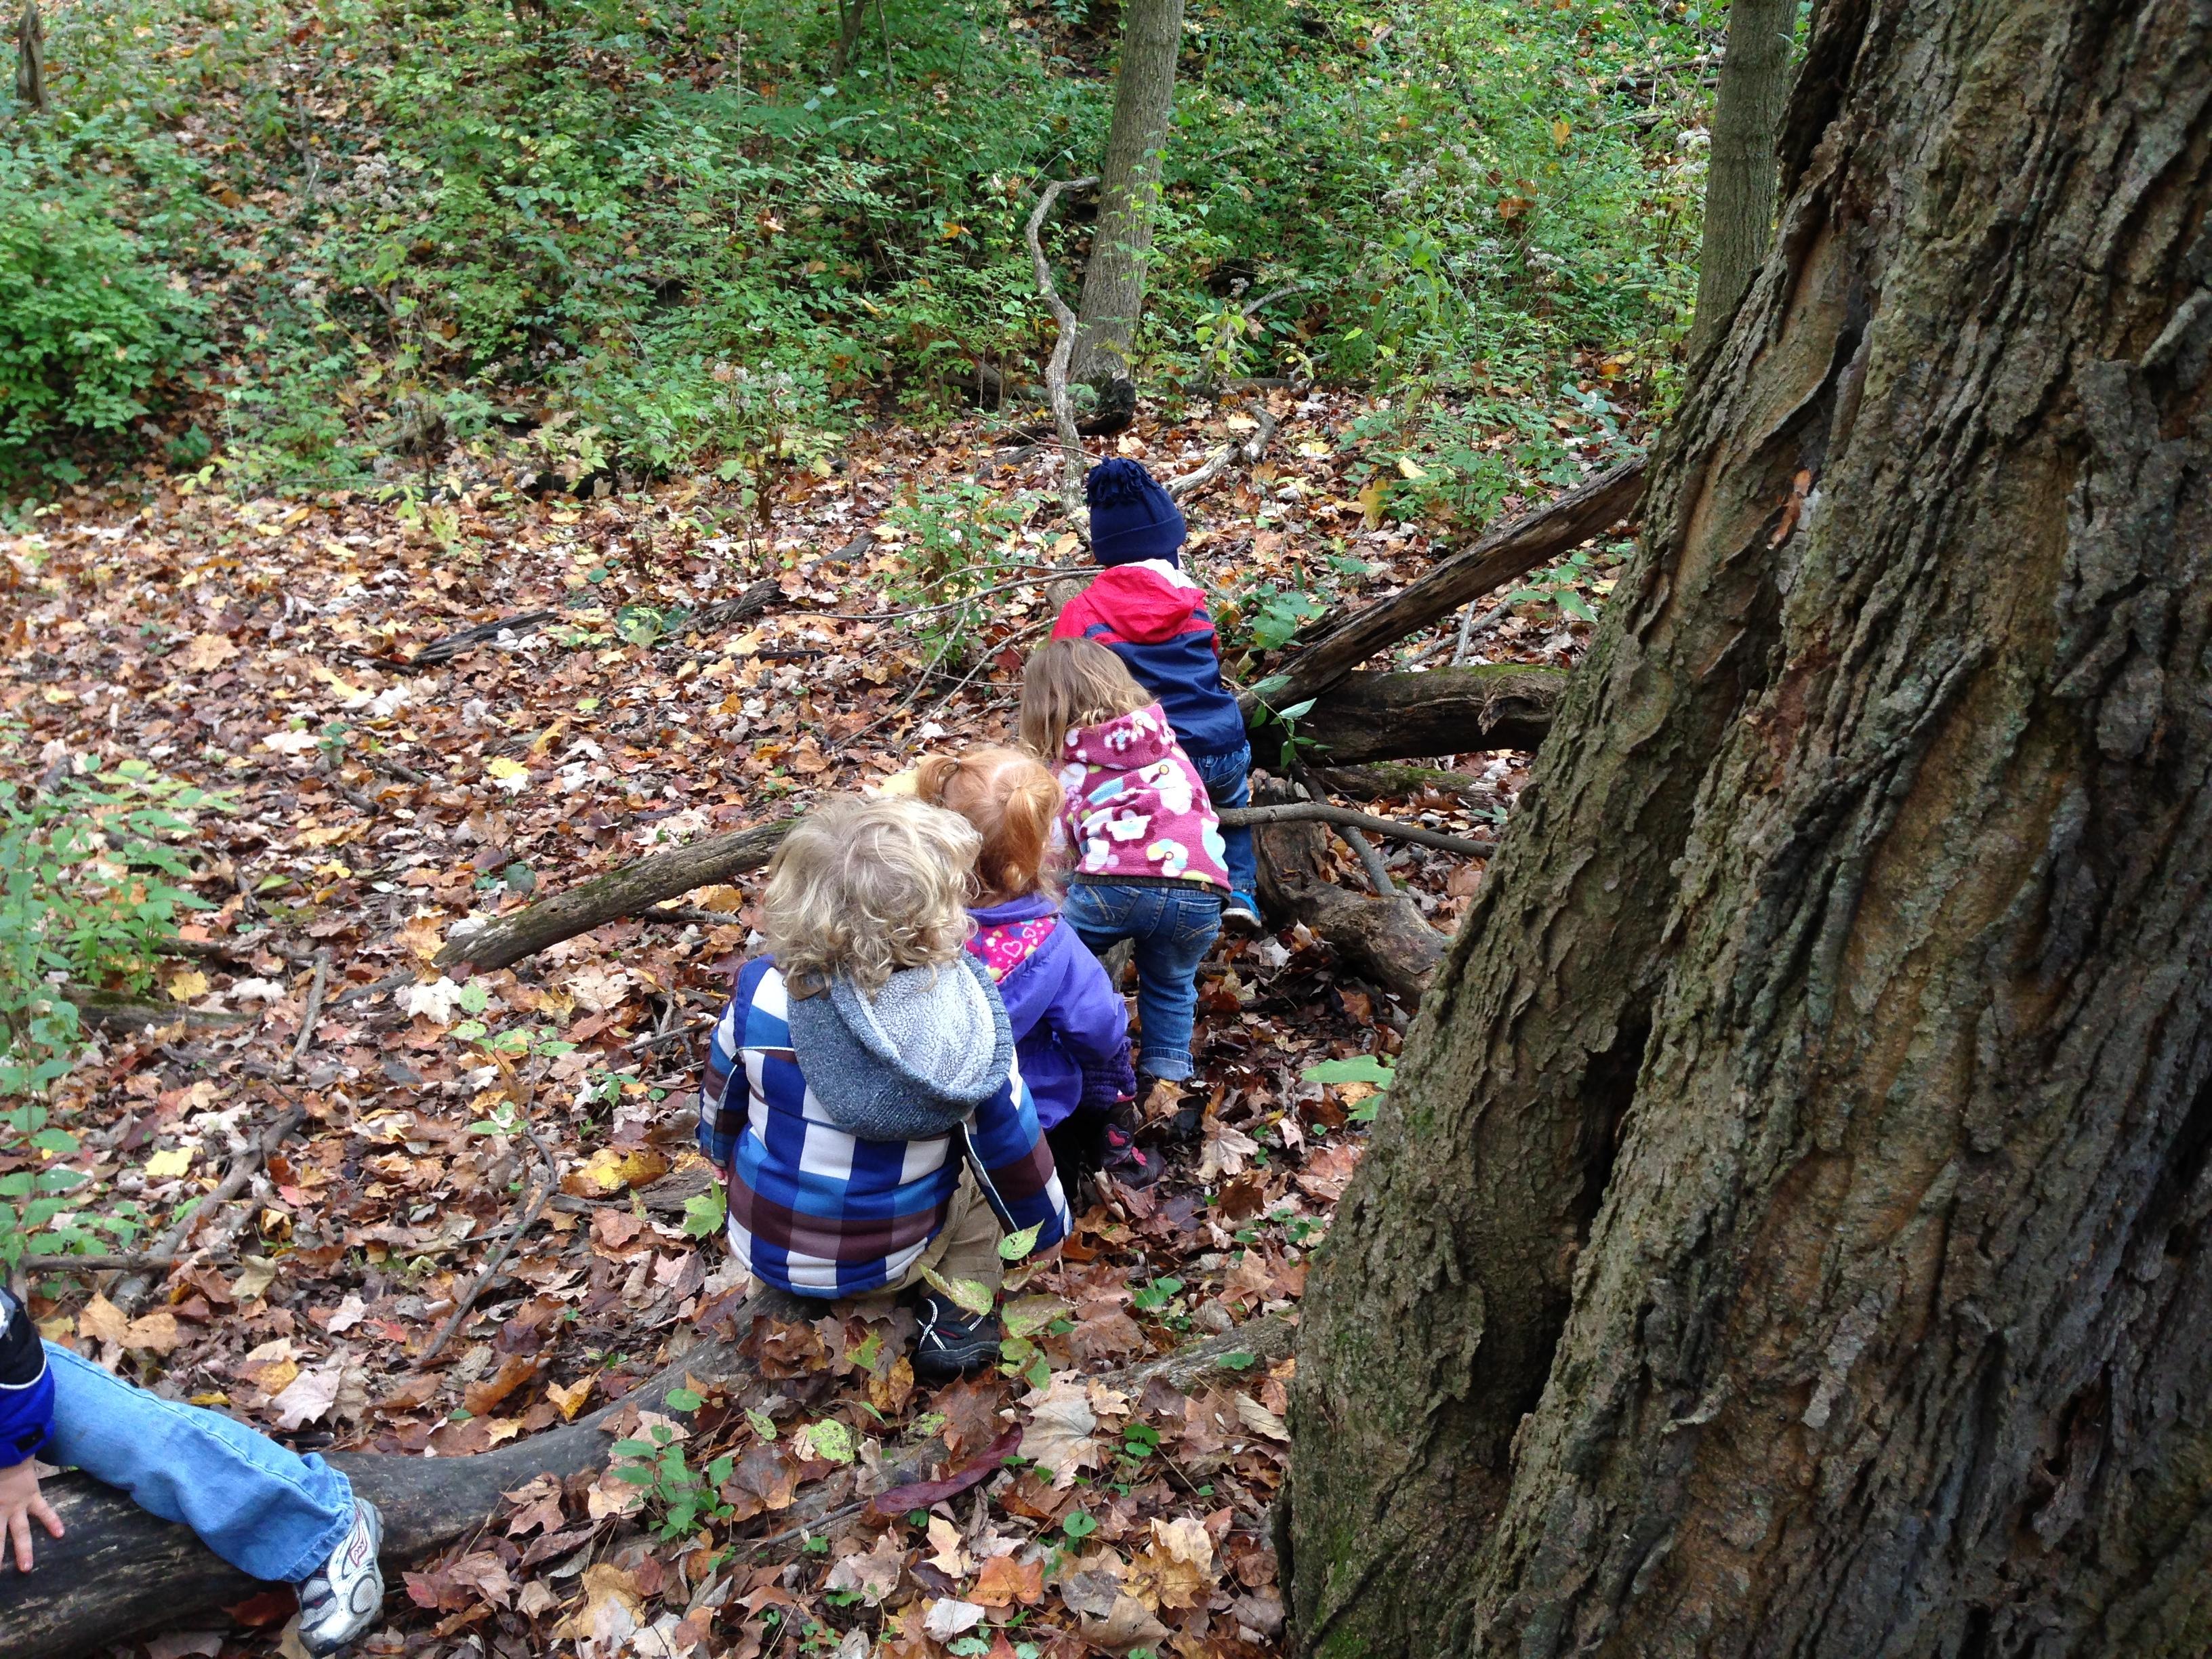 Joyful Outdoor Collaboration